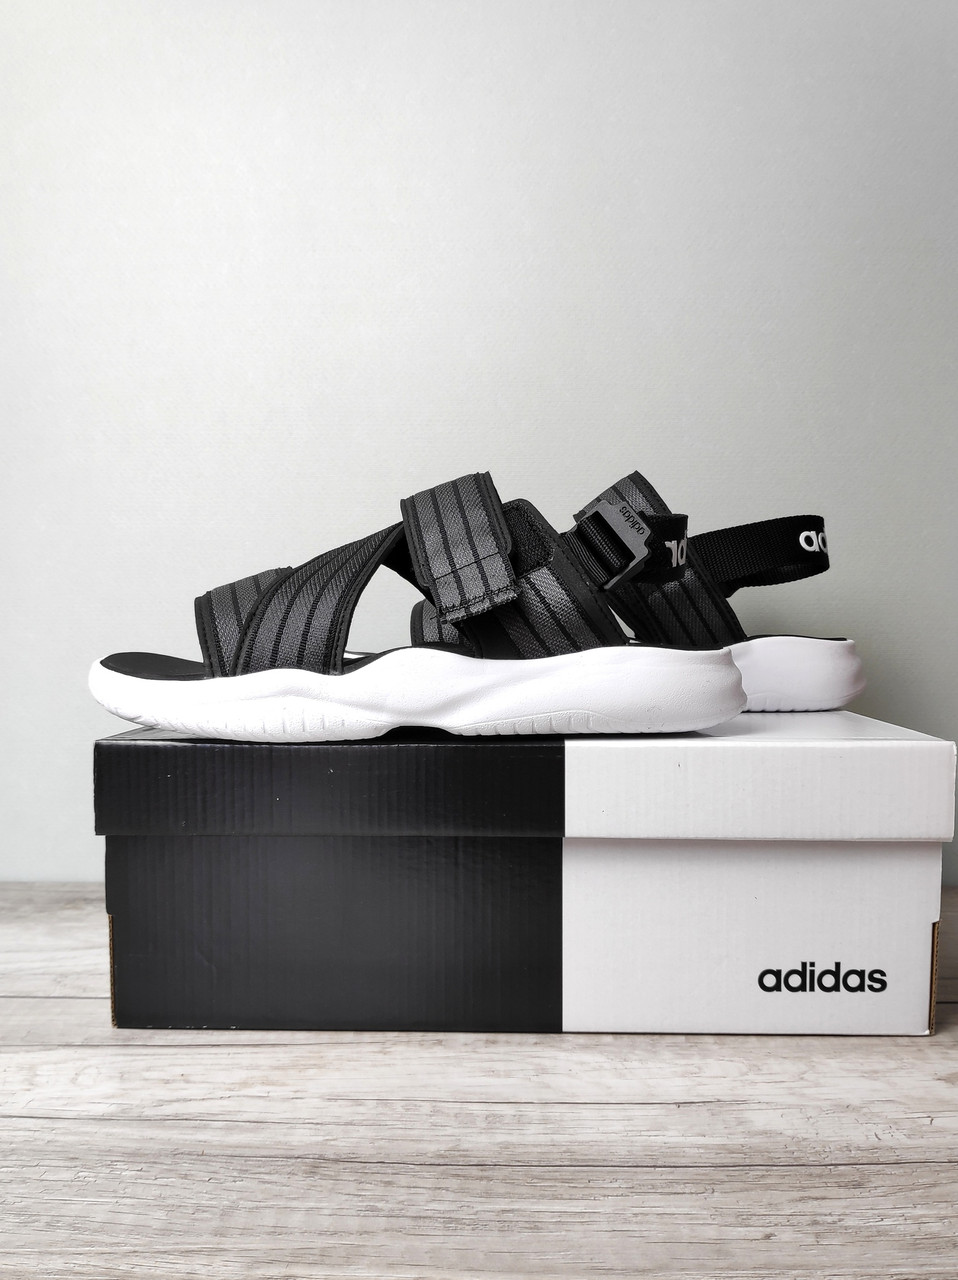 Босоножки Adidas Adilette Sandal/ босоножки адидас адилетте